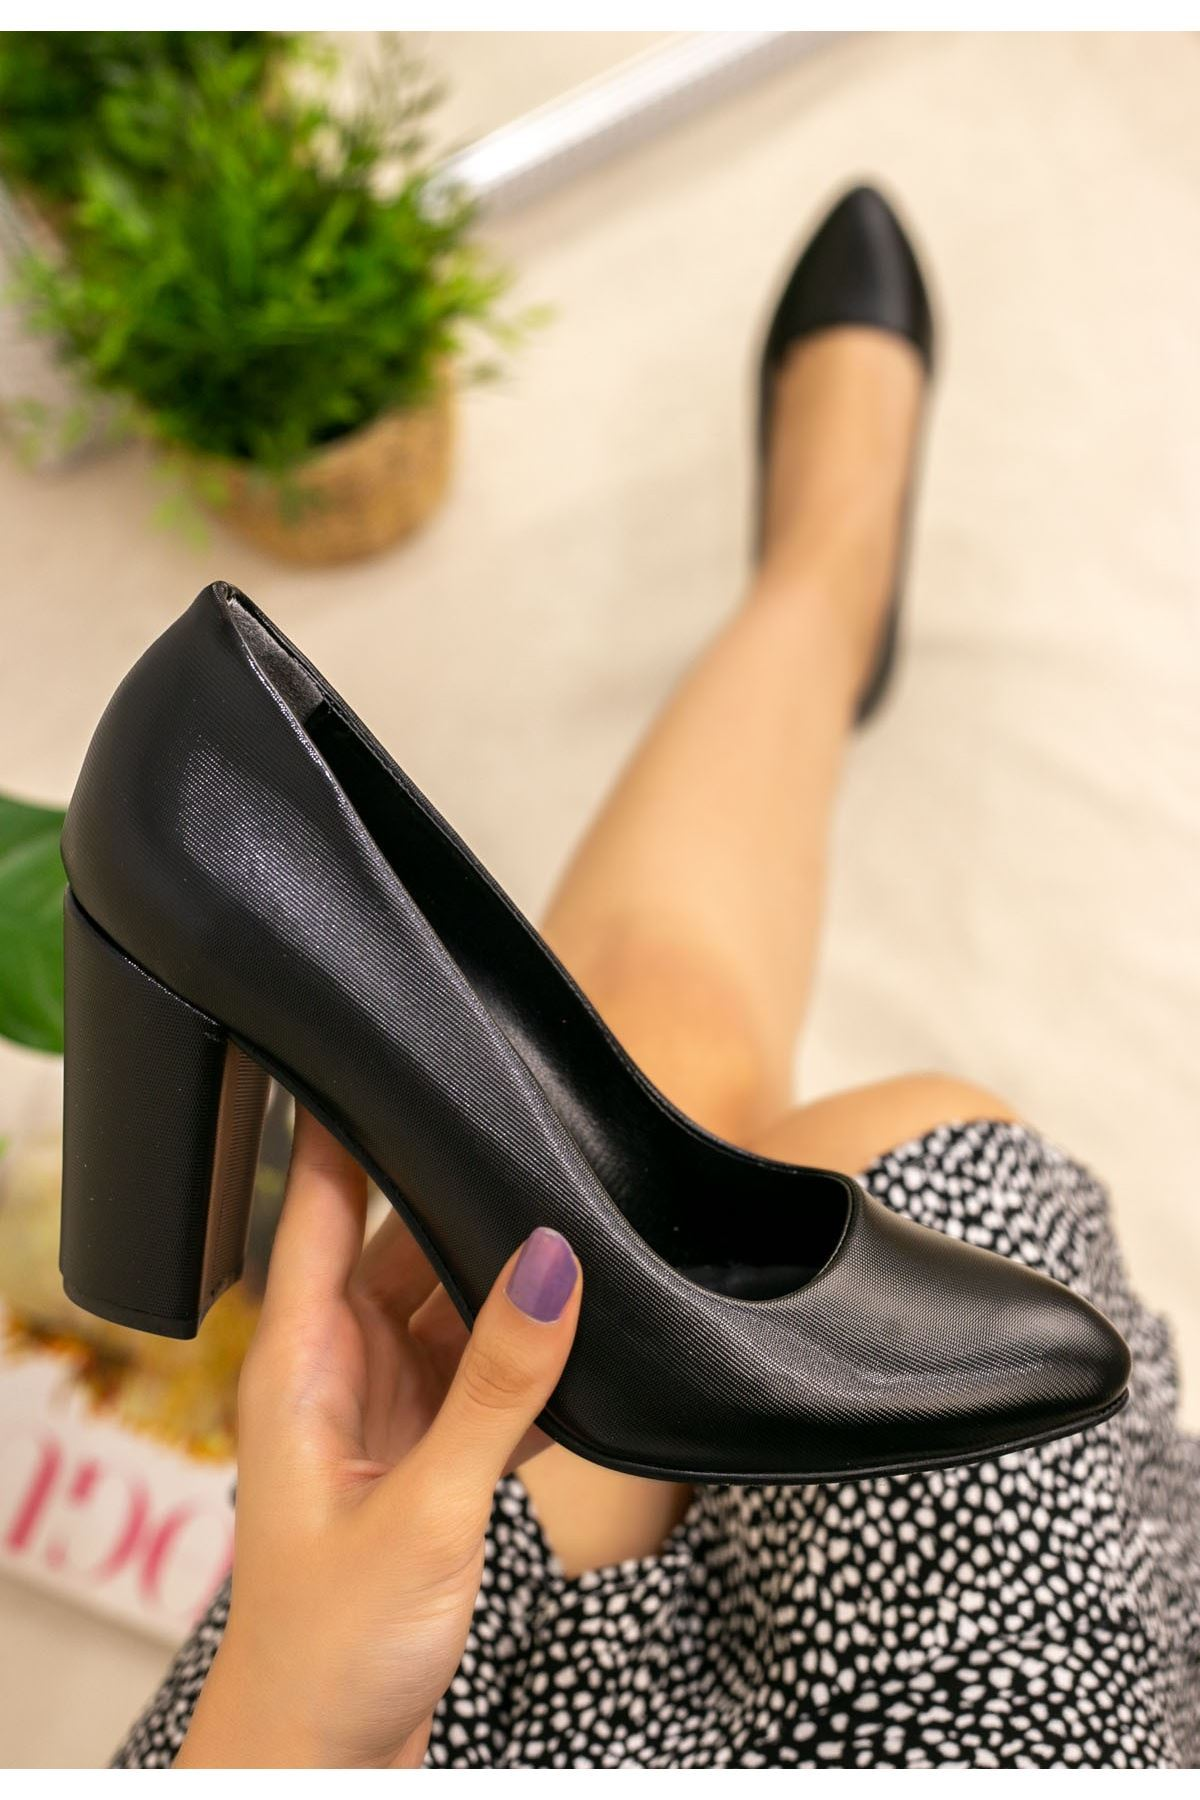 Sashi Siyah Desenli Topuklu Ayakkabı